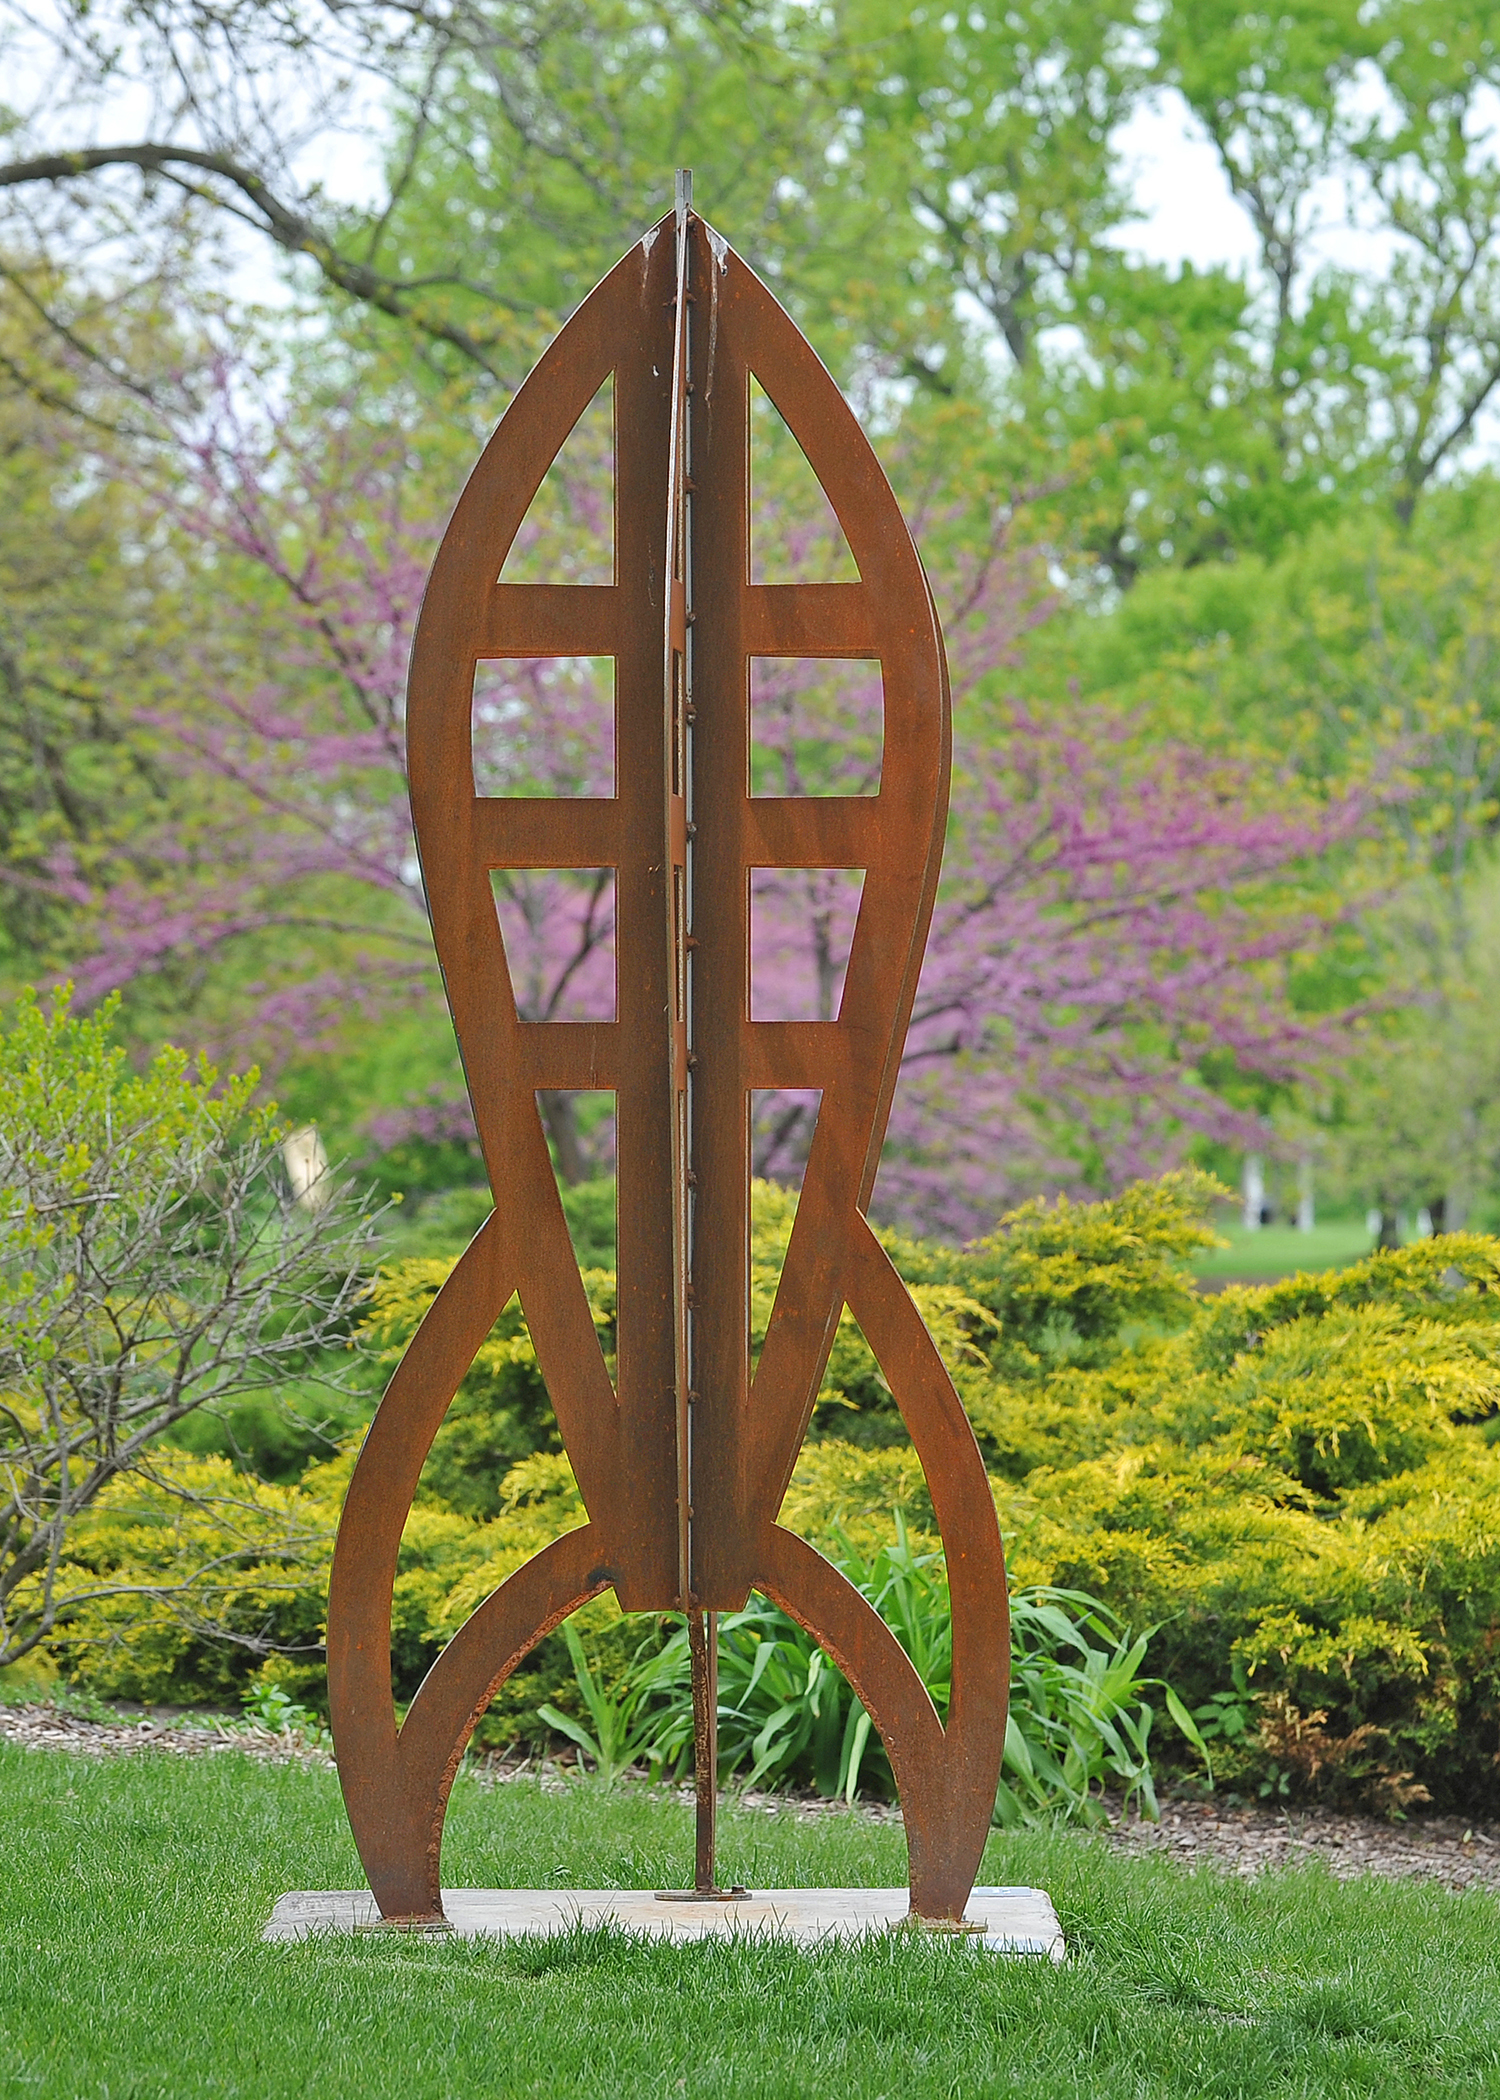 Sculpture in the Park.jpg